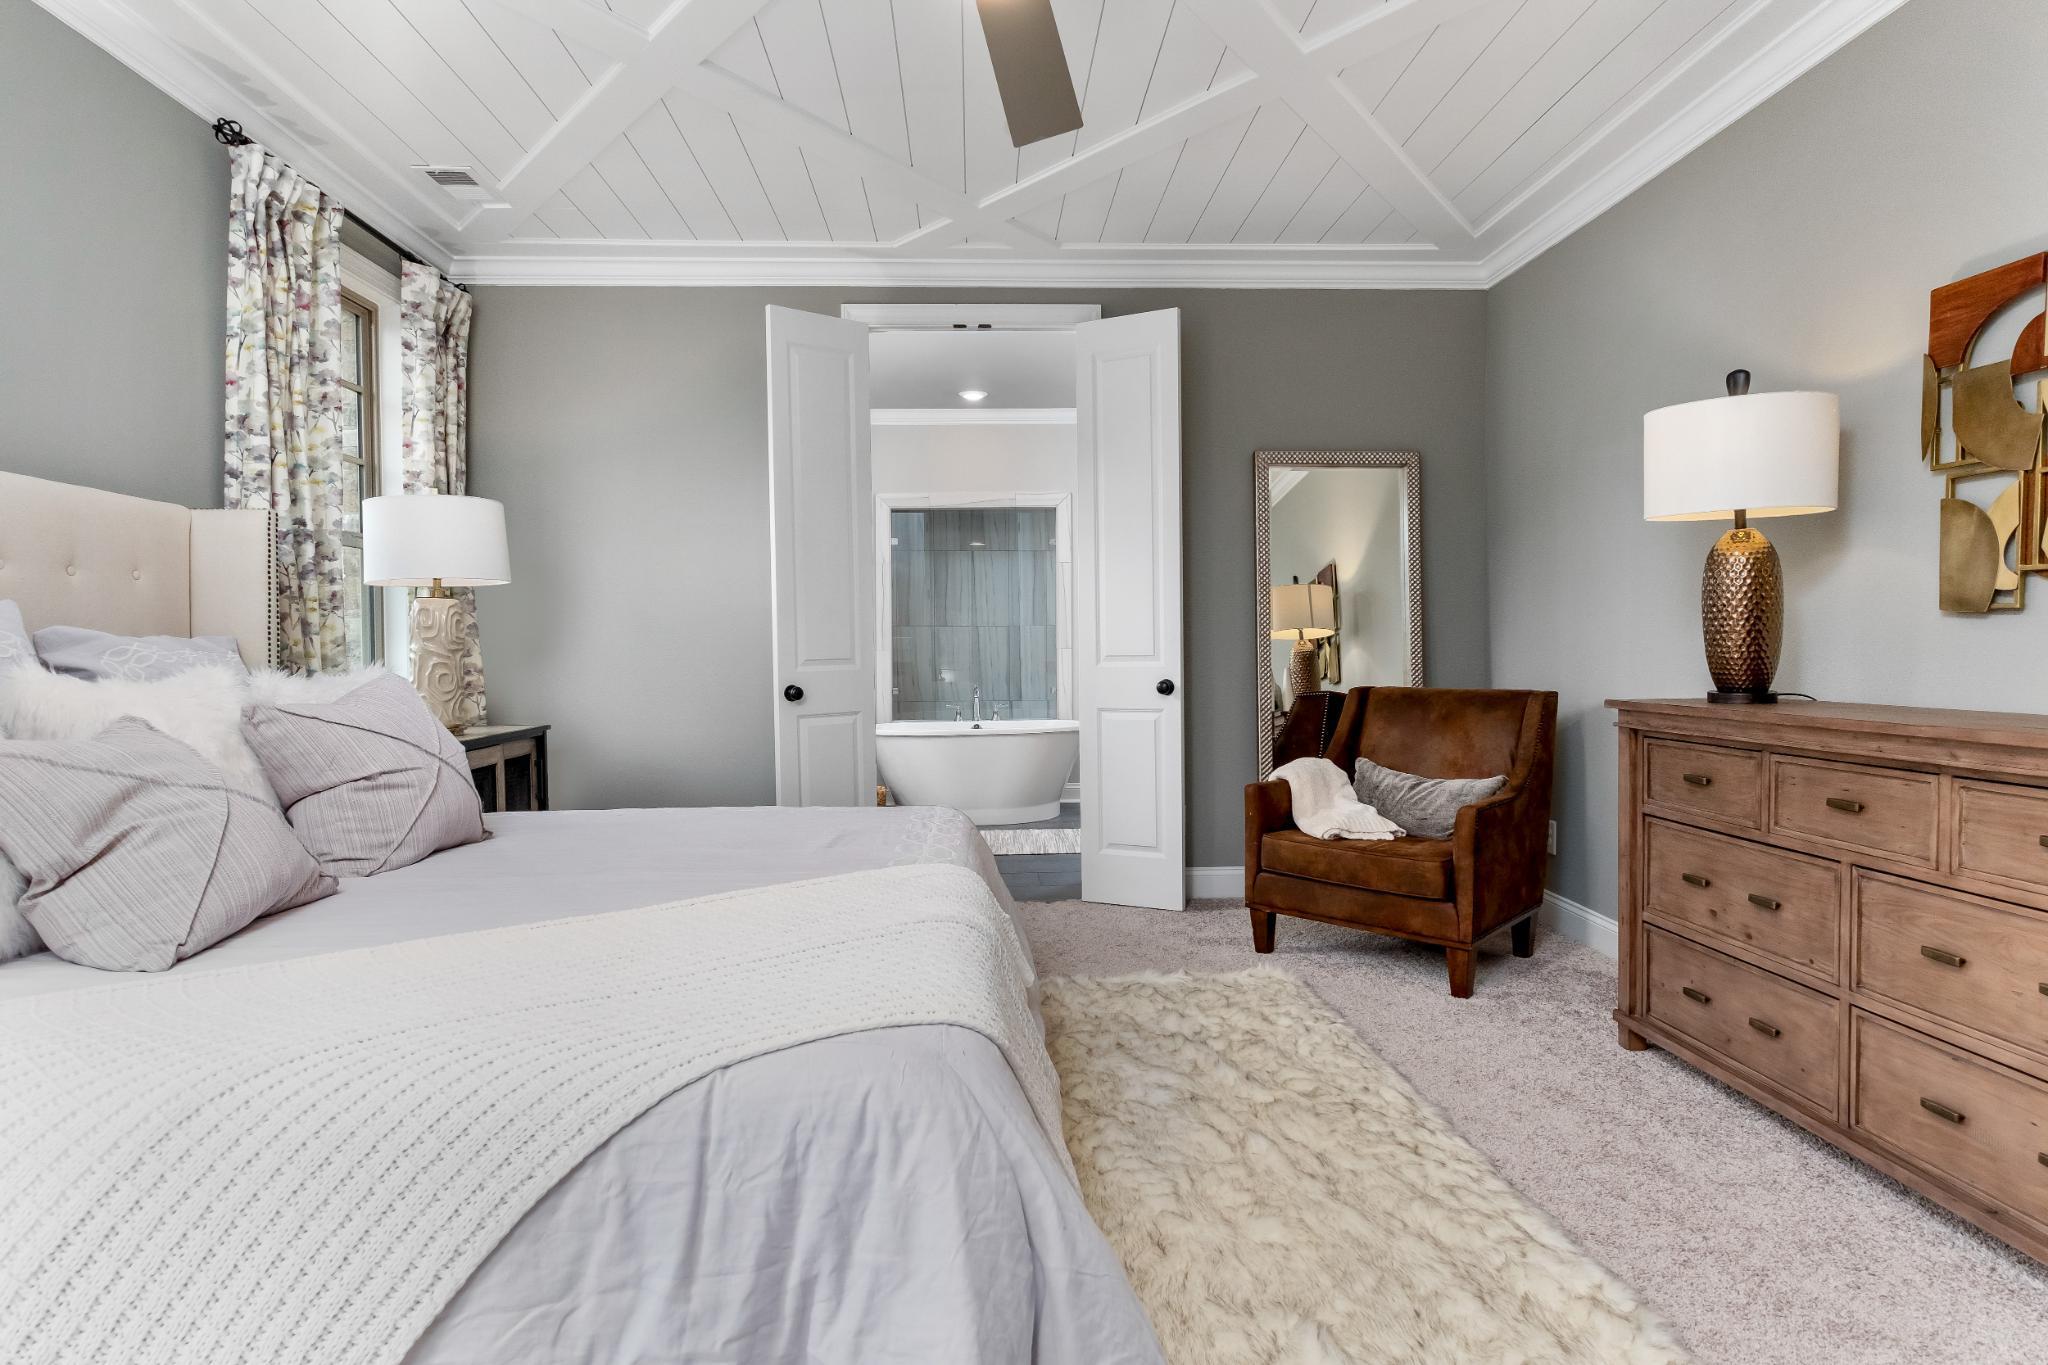 Bedroom featured in the Rosemont By Harris Doyle Homes Inc in Birmingham, AL